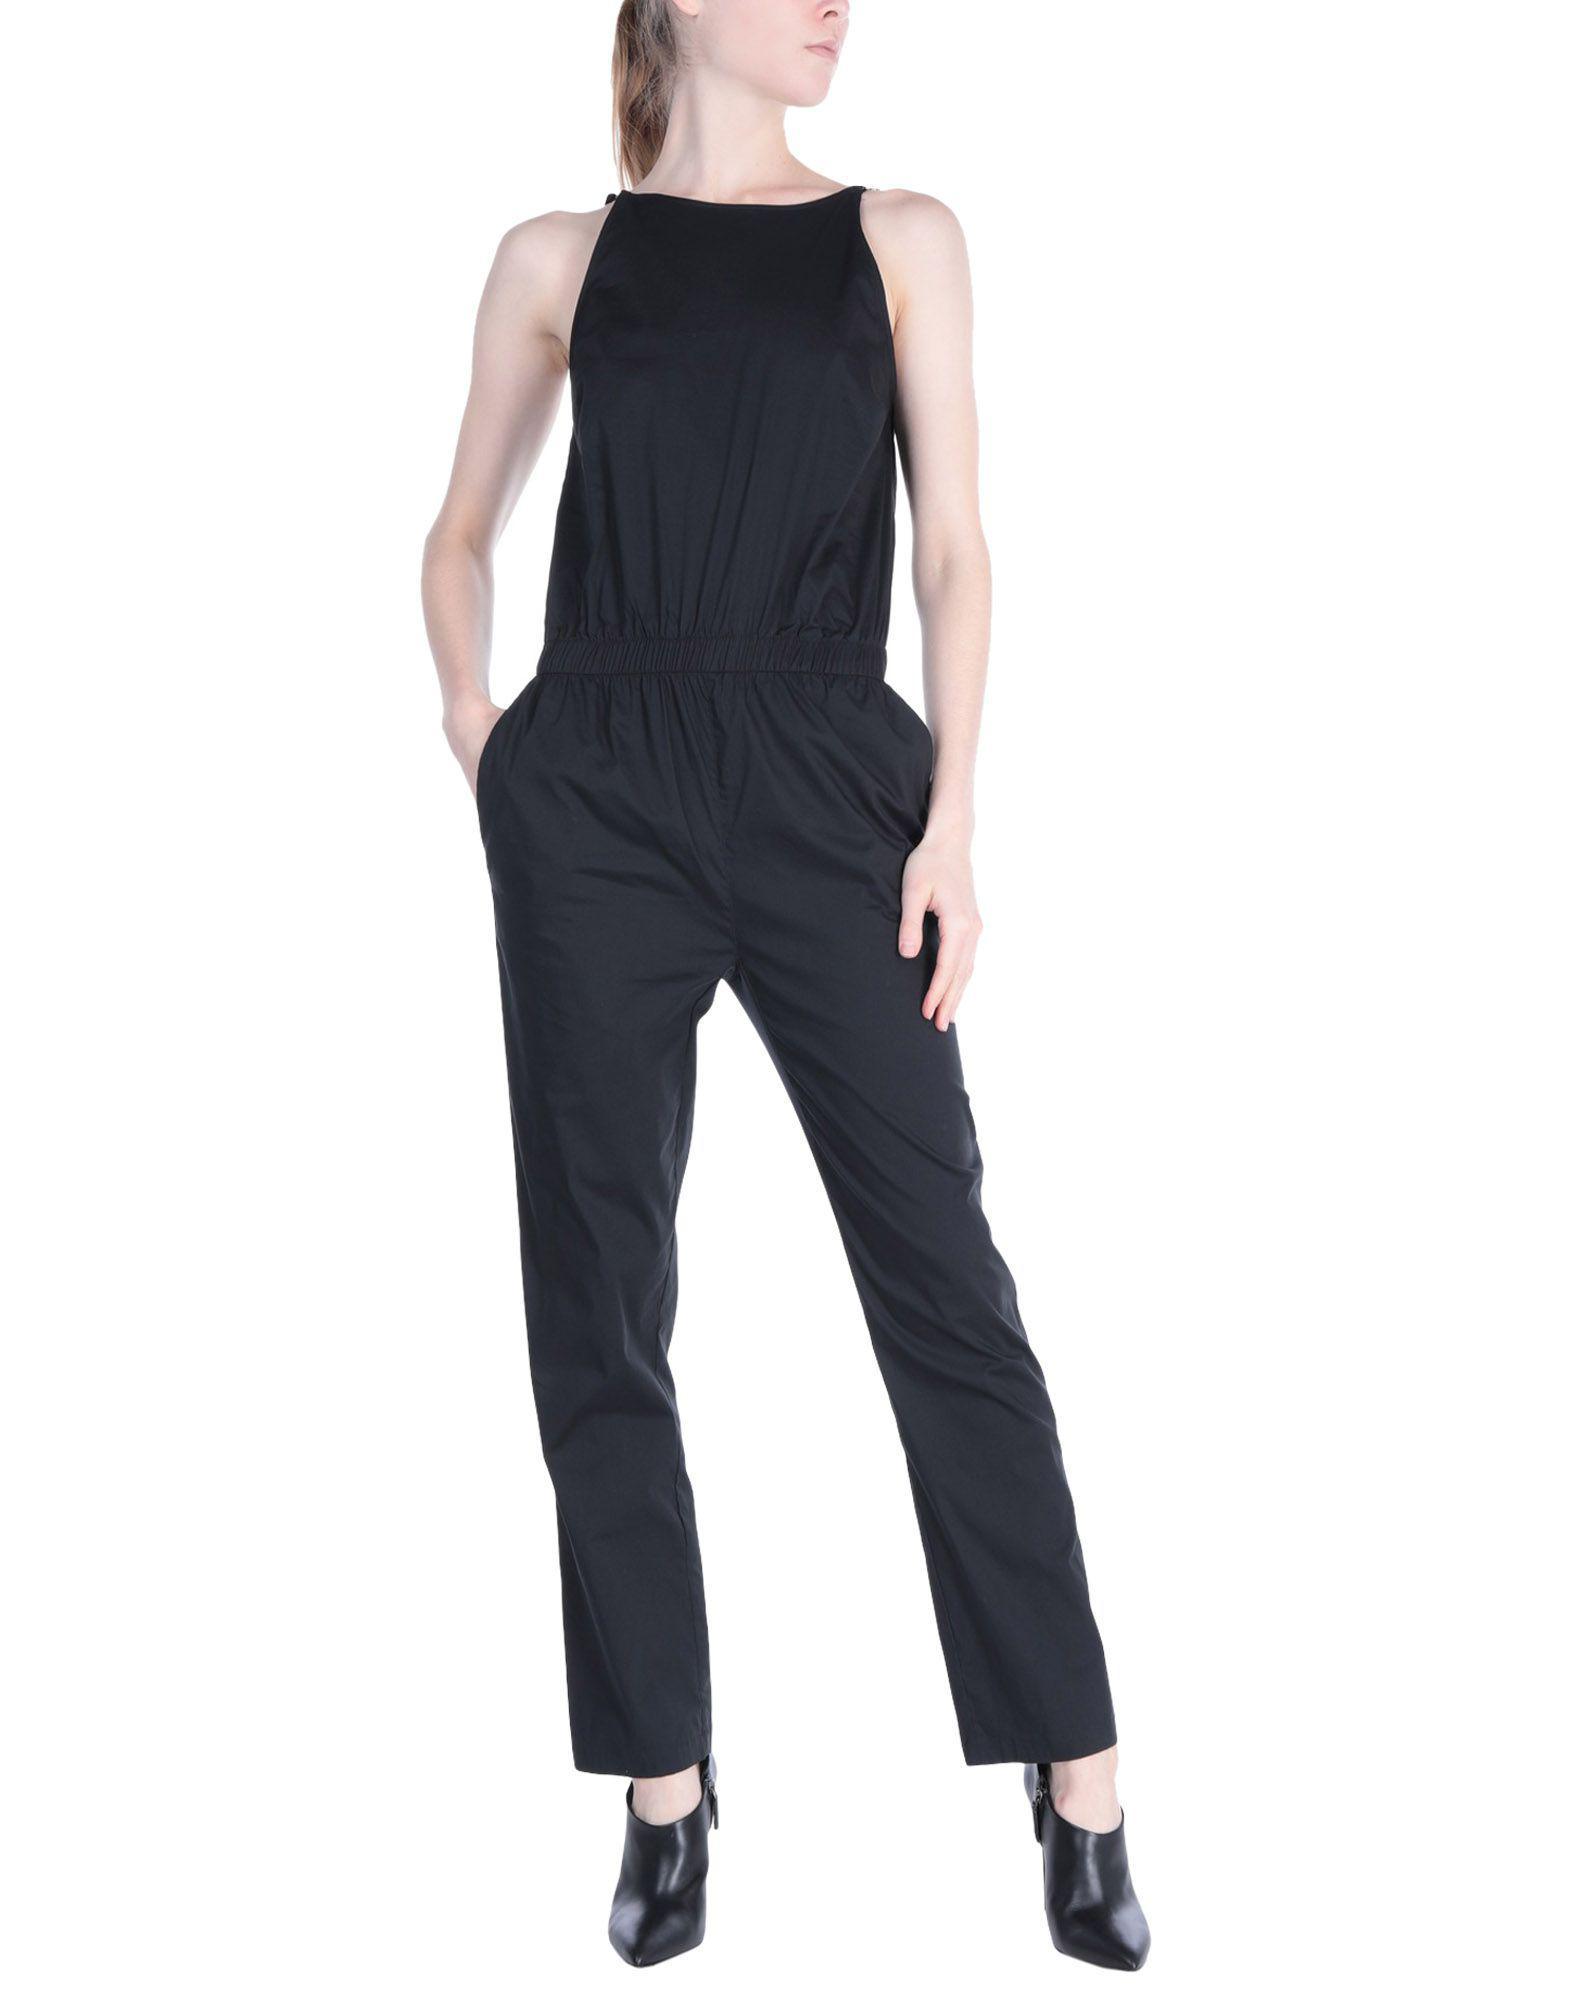 60363edb0bf Lyst - Patrizia Pepe Jumpsuit in Black